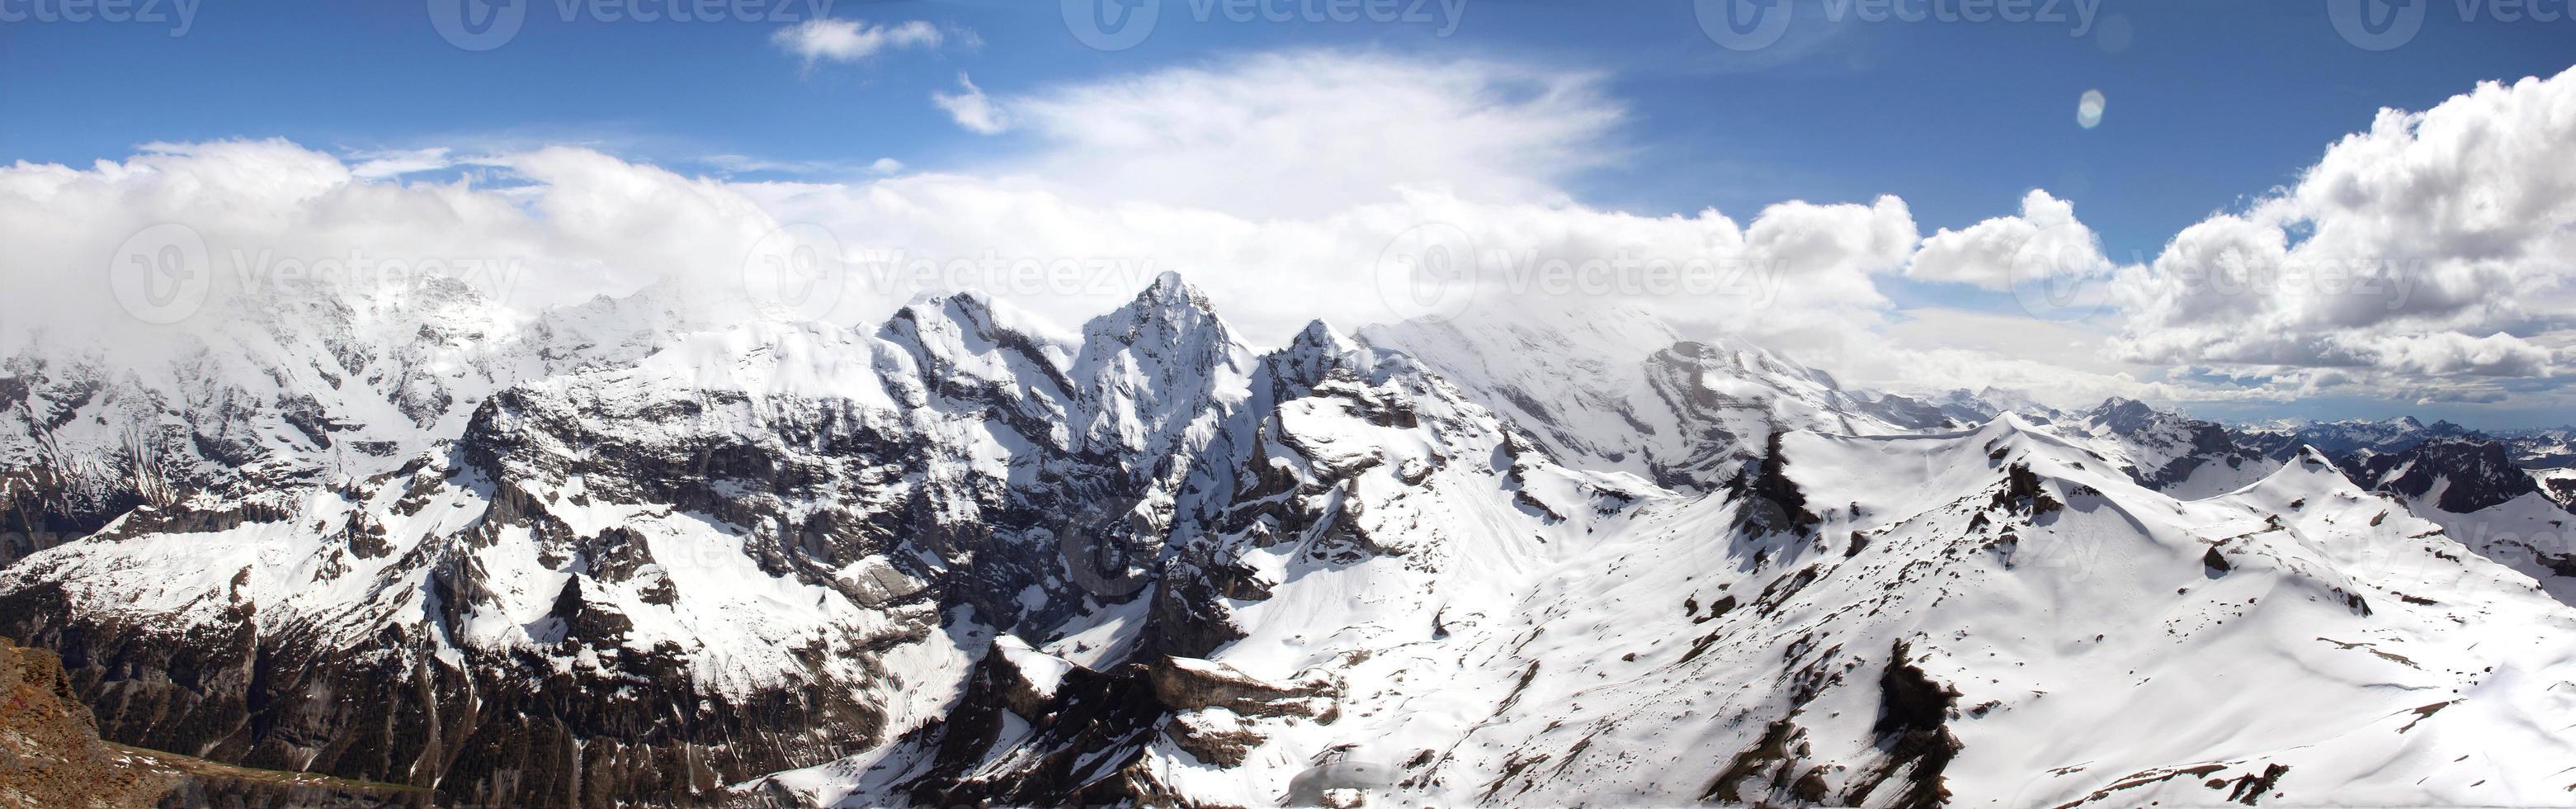 Panaorma of the alps in switzerland photo